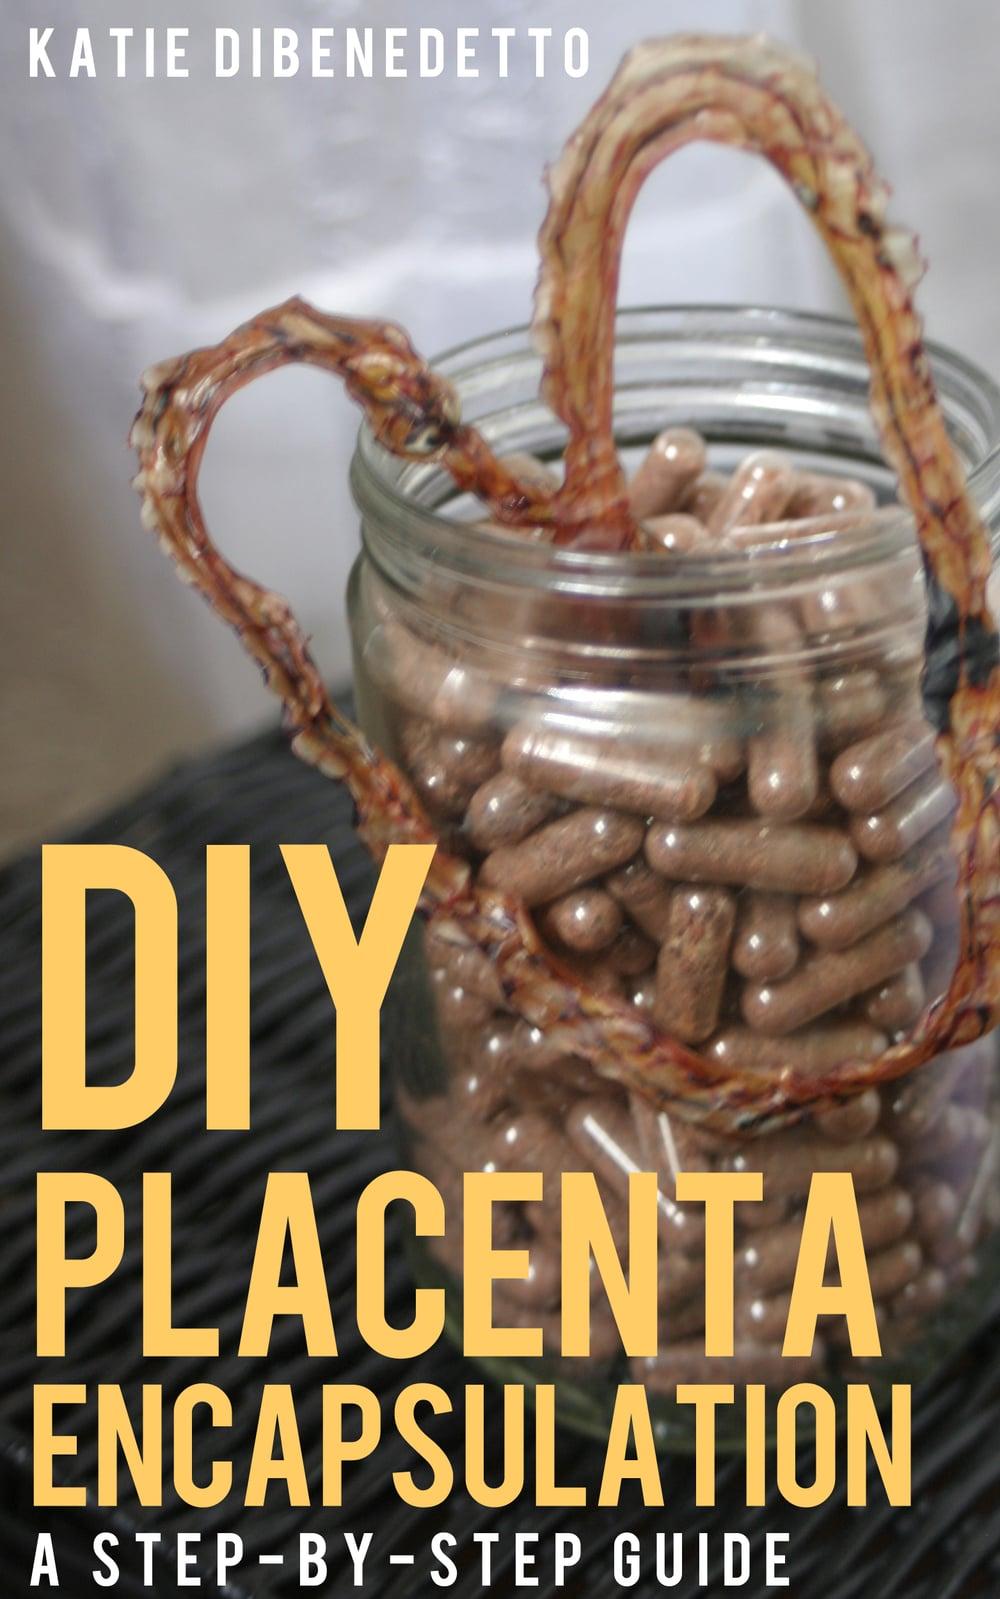 DIY Placenta Encapsulation | Cock & Crow #diy #placenta #encapsulation